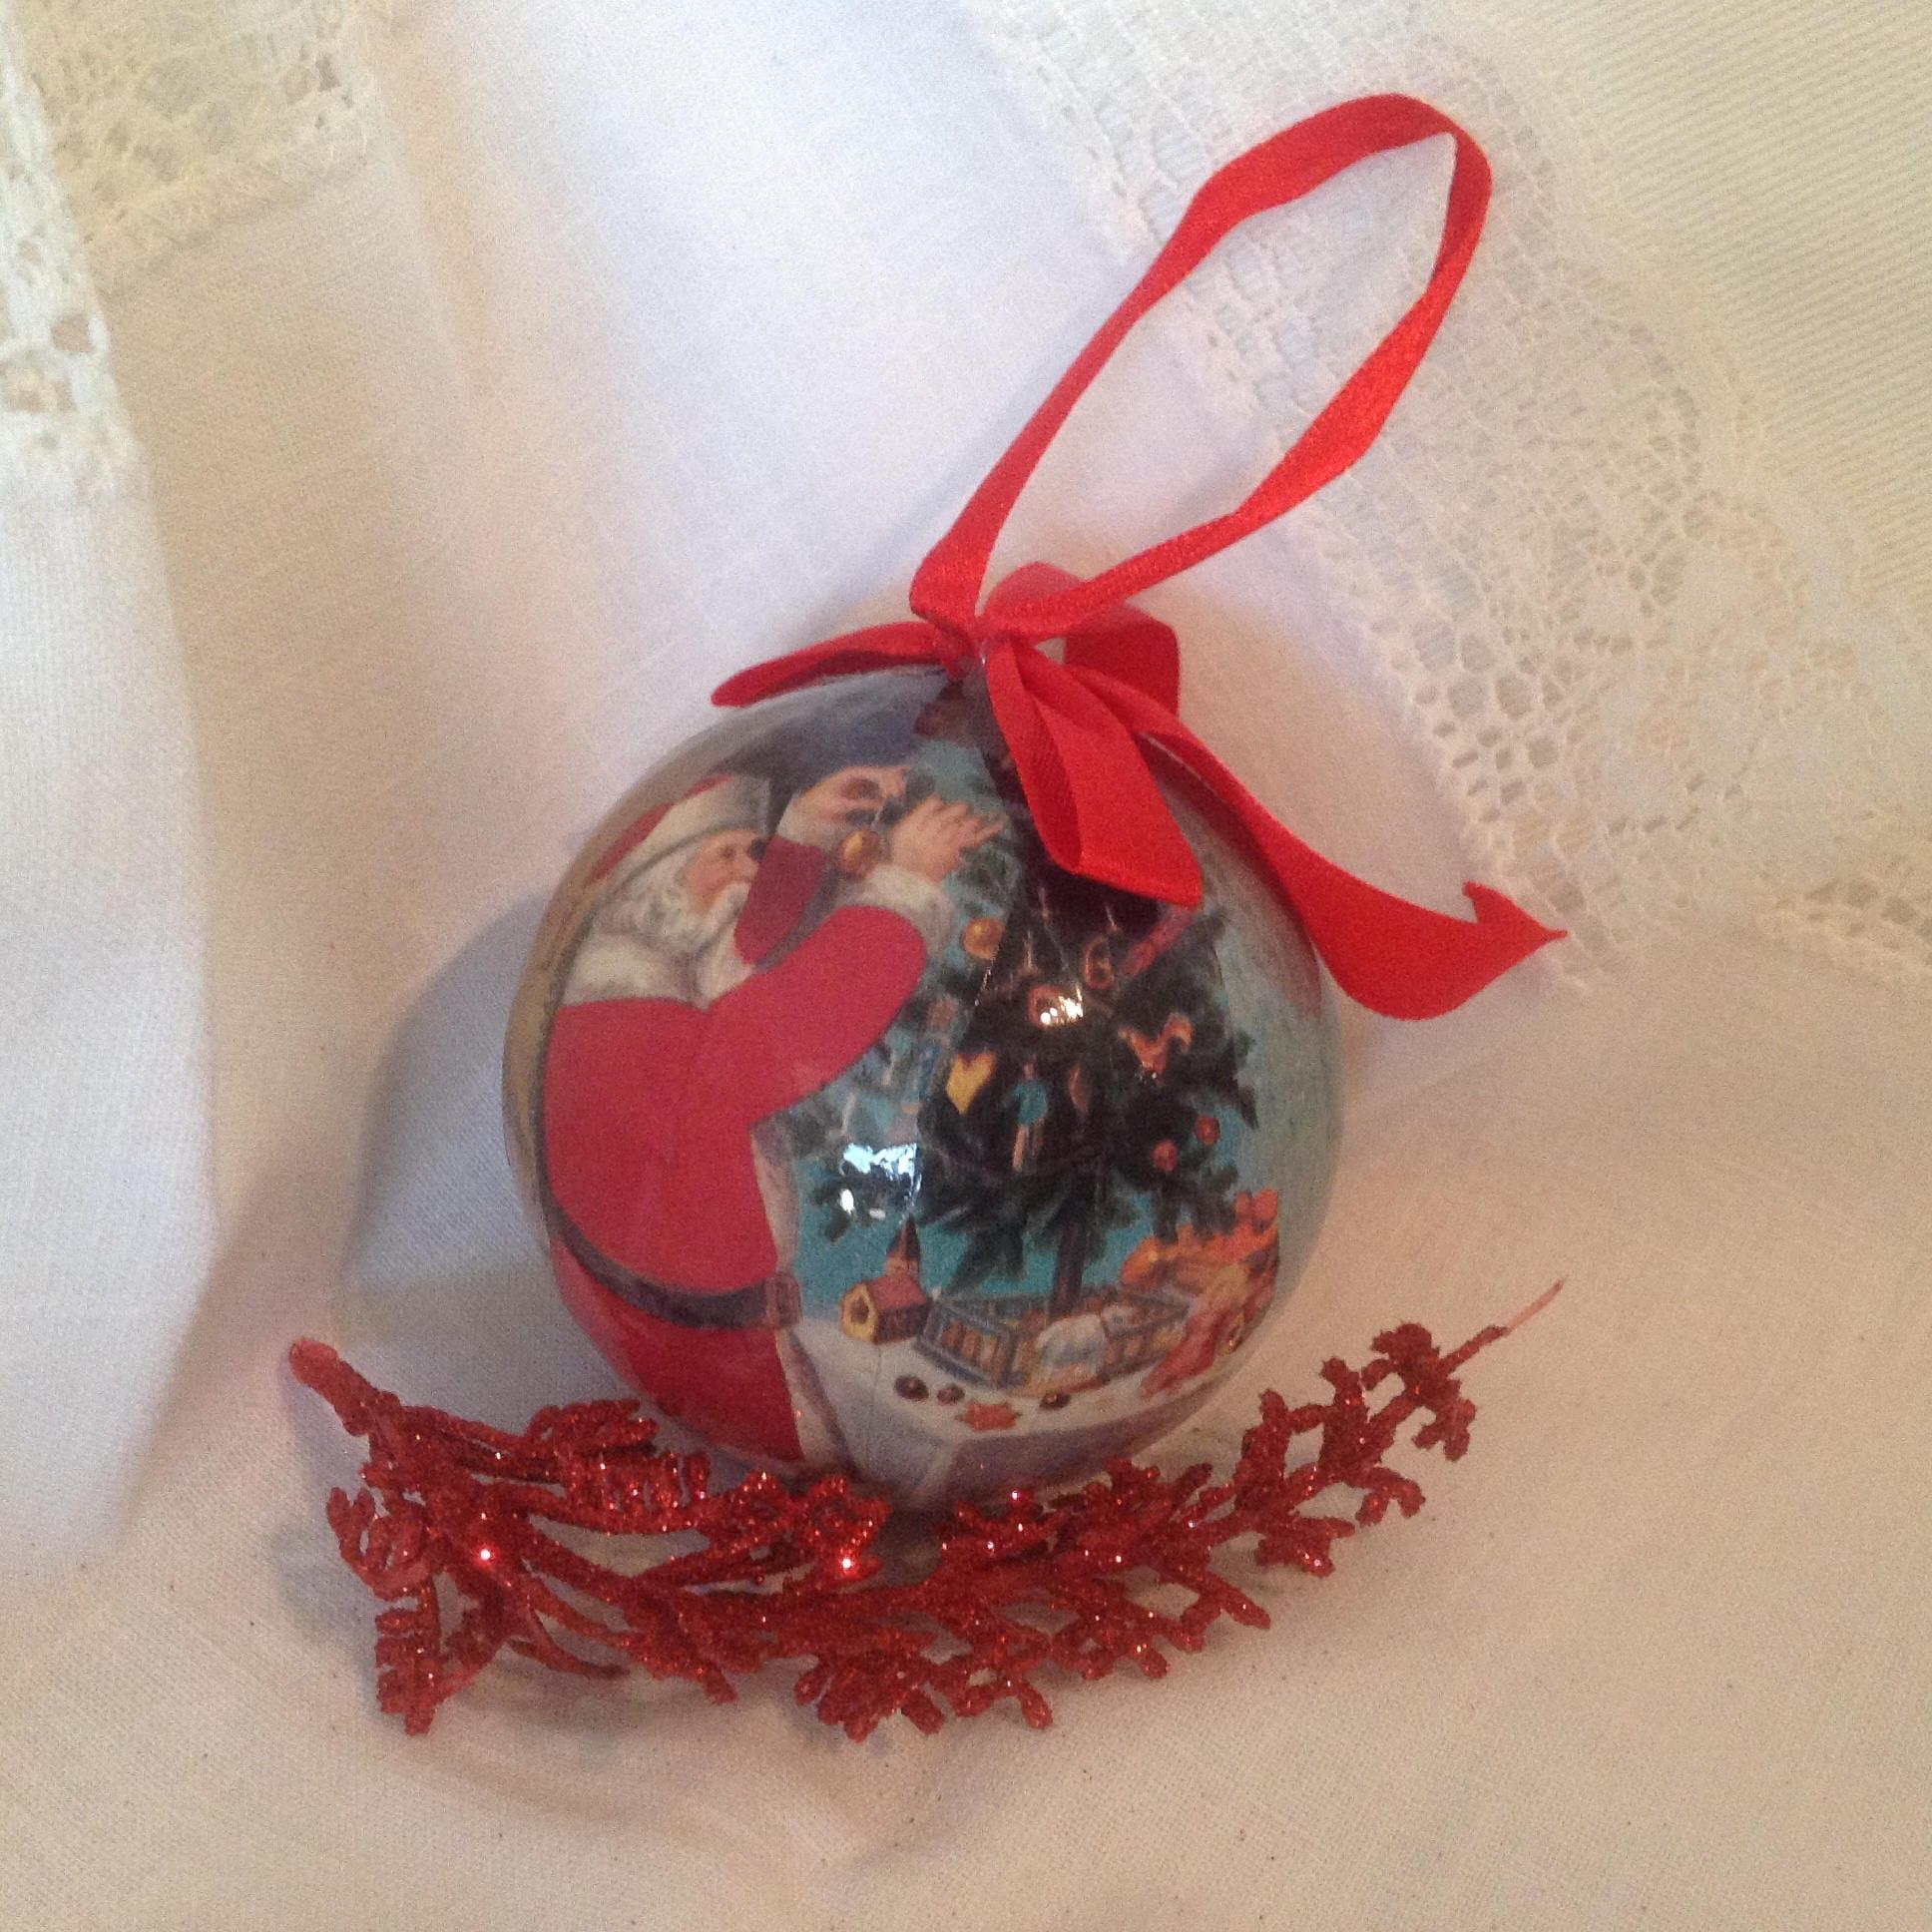 Vintage Paper Mache Christmas ball ornament / FREE ...